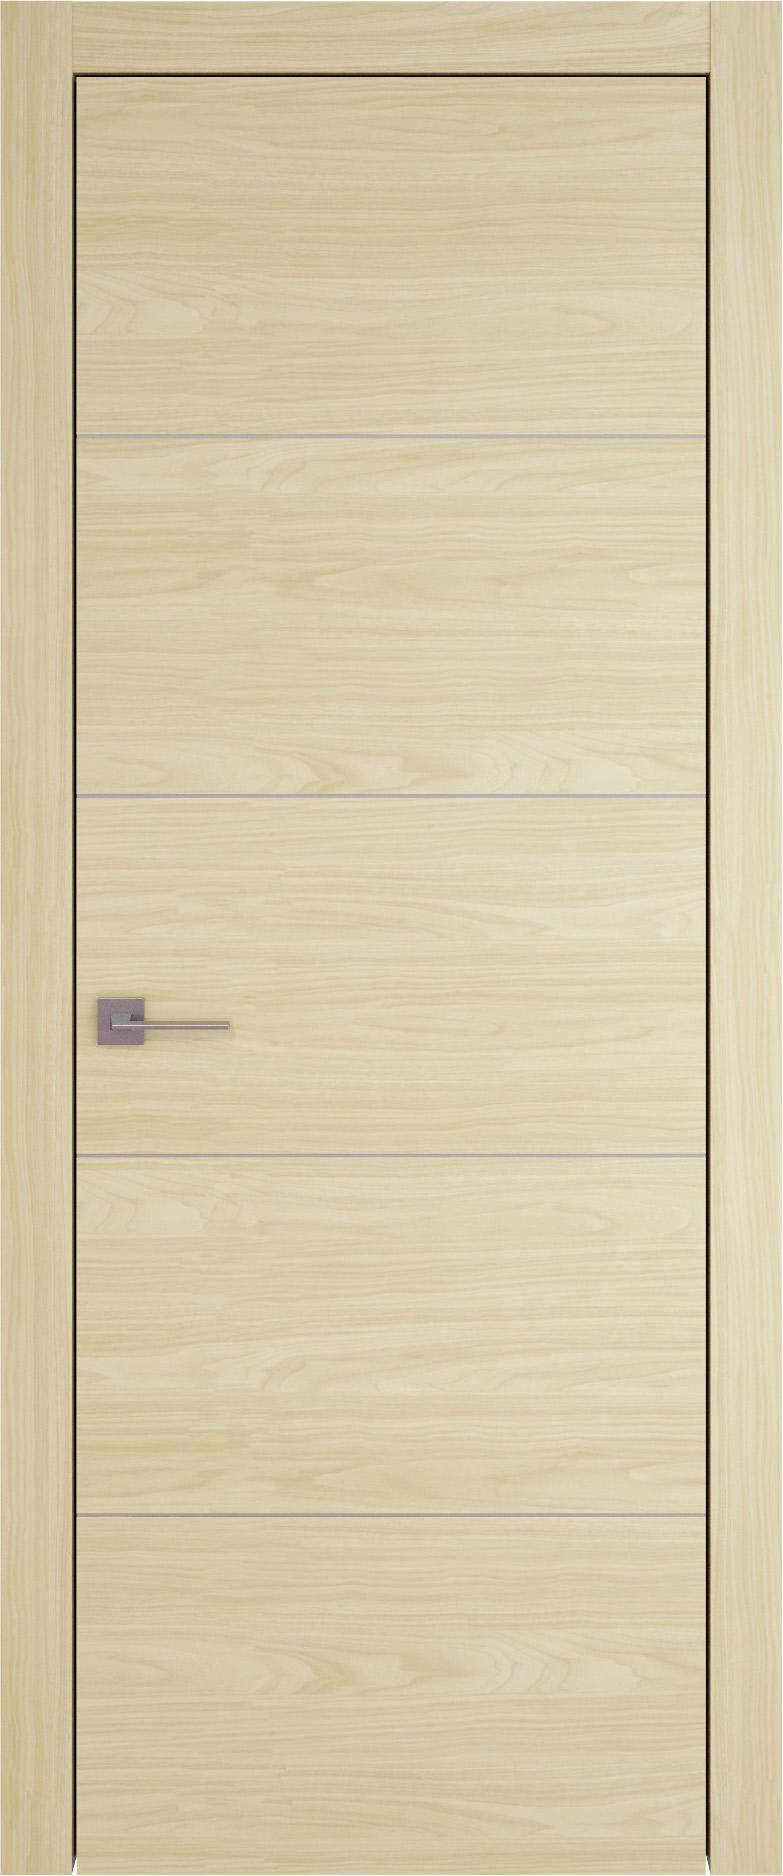 Tivoli Д-3 цвет - Дуб нордик Без стекла (ДГ)